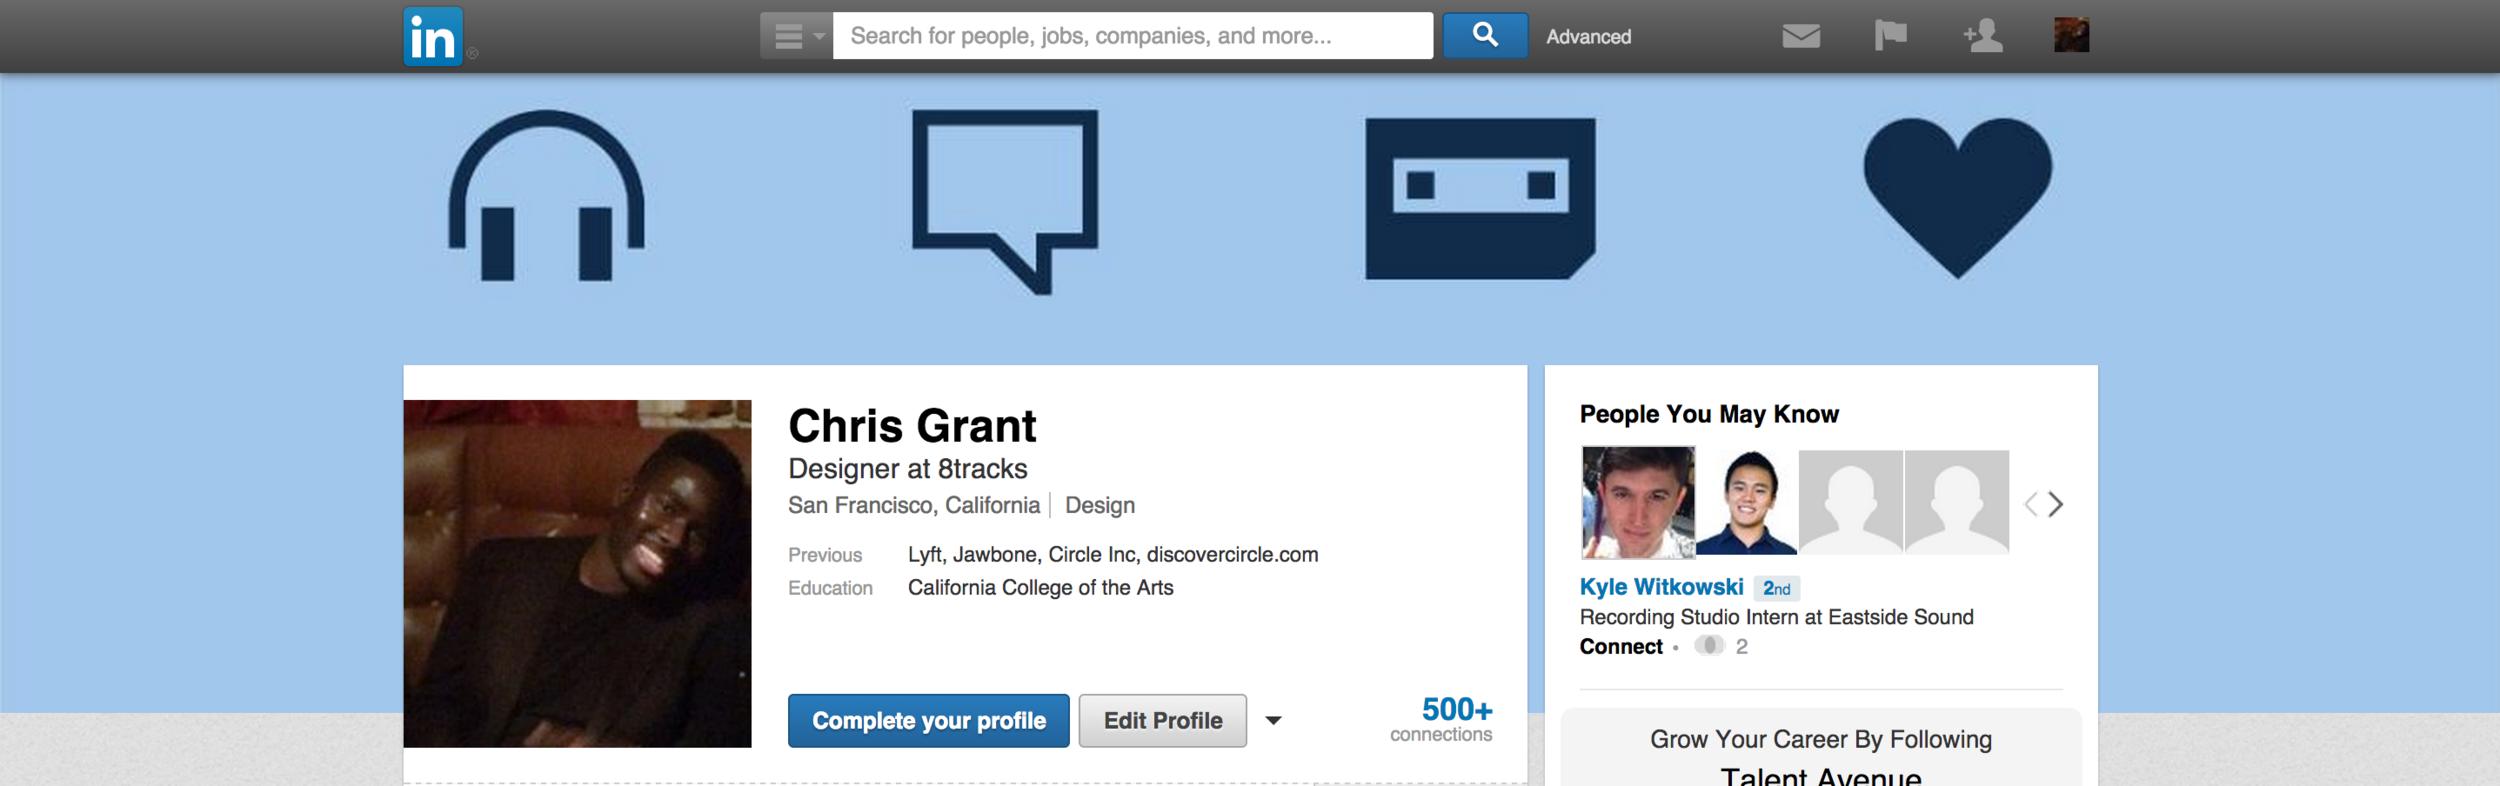 LinkedIn Cover-photos   brand/identity, visual design